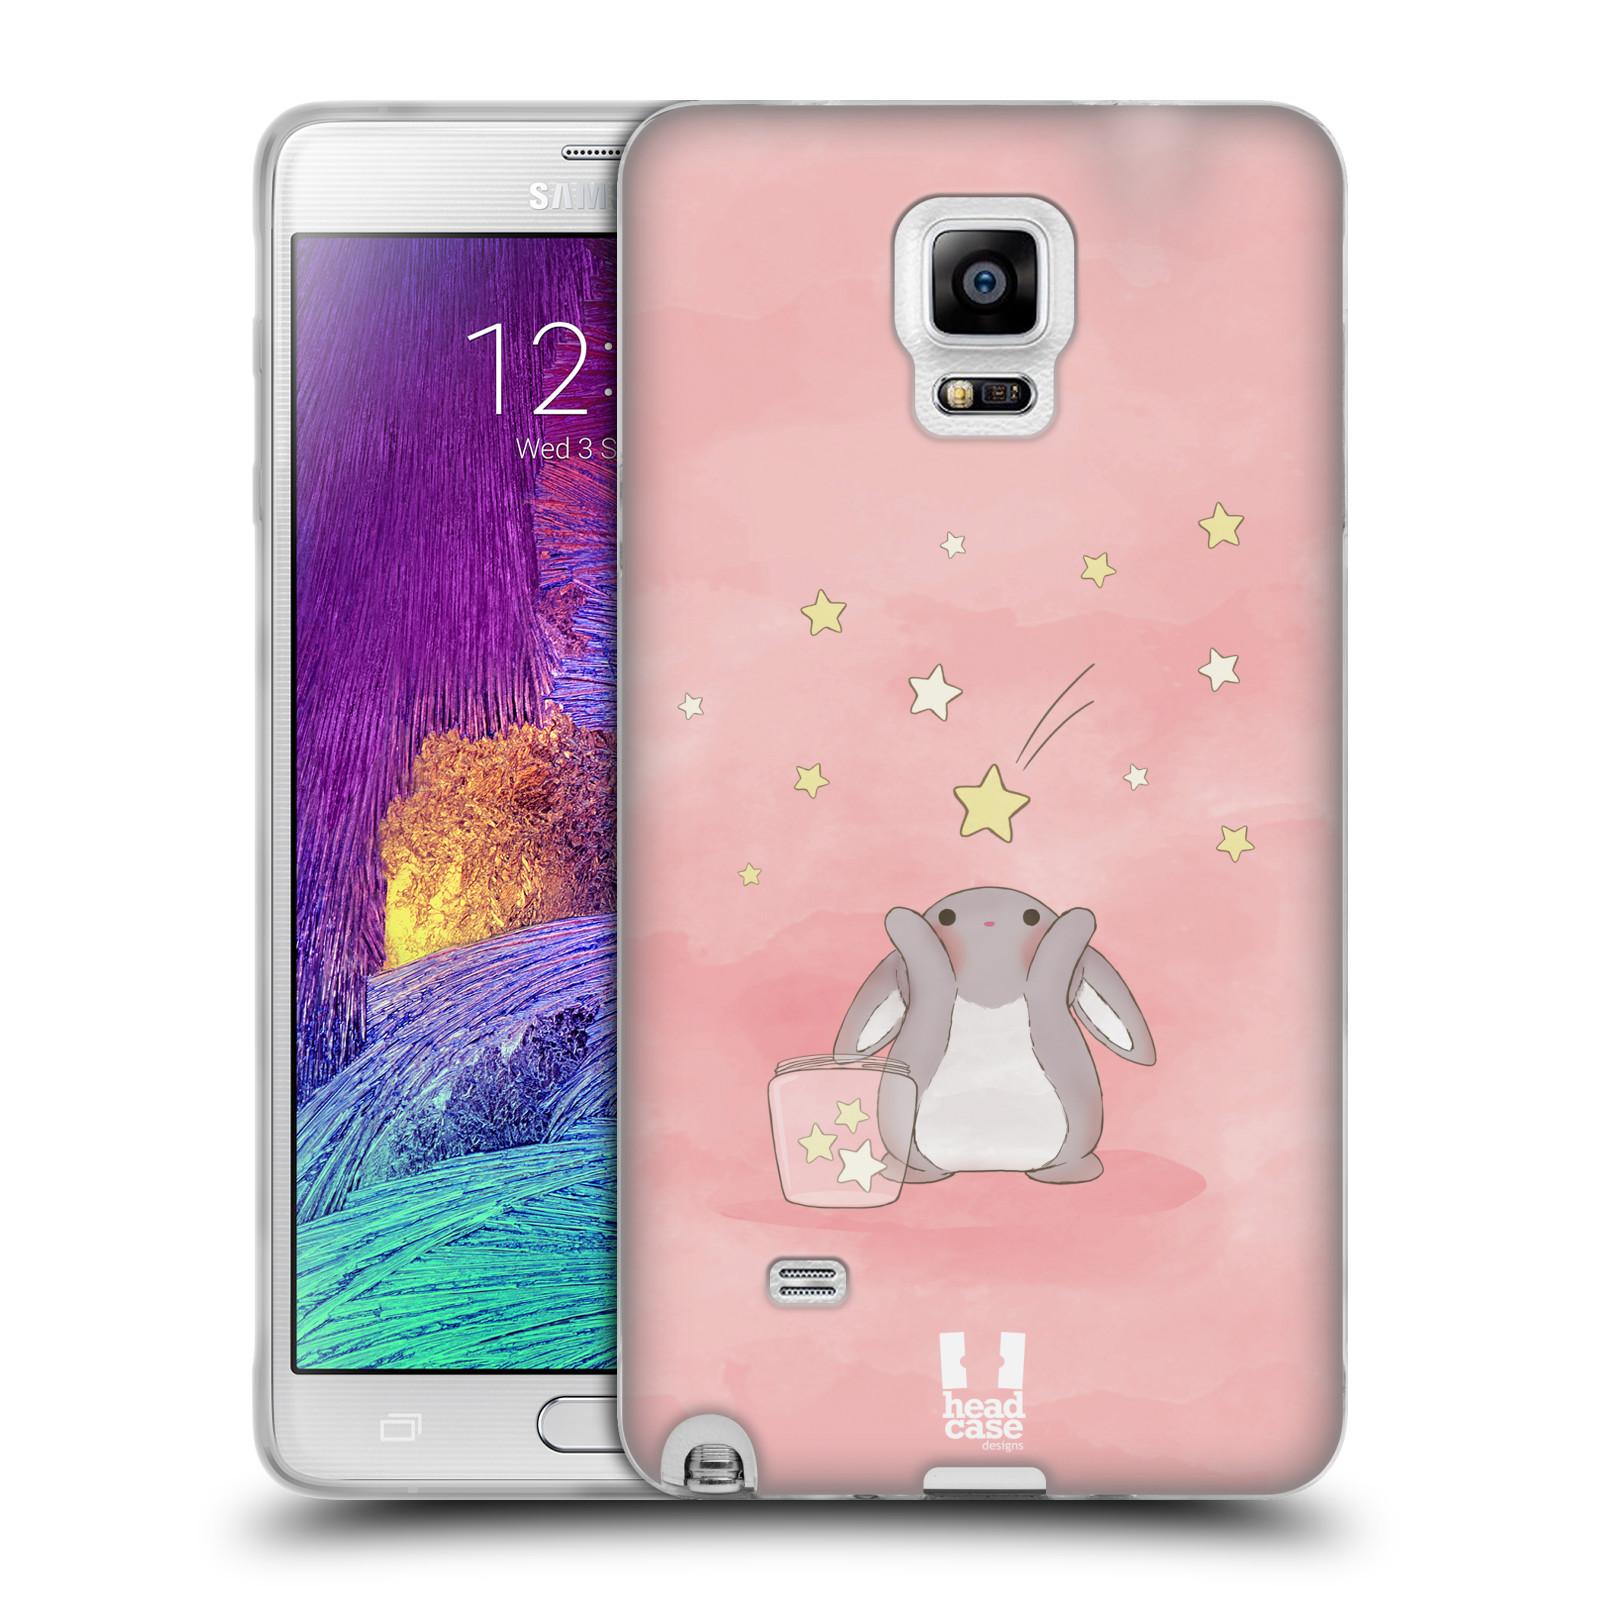 HEAD CASE silikonový obal na mobil Samsung Galaxy Note 4 (N910) vzor králíček a hvězdy růžová